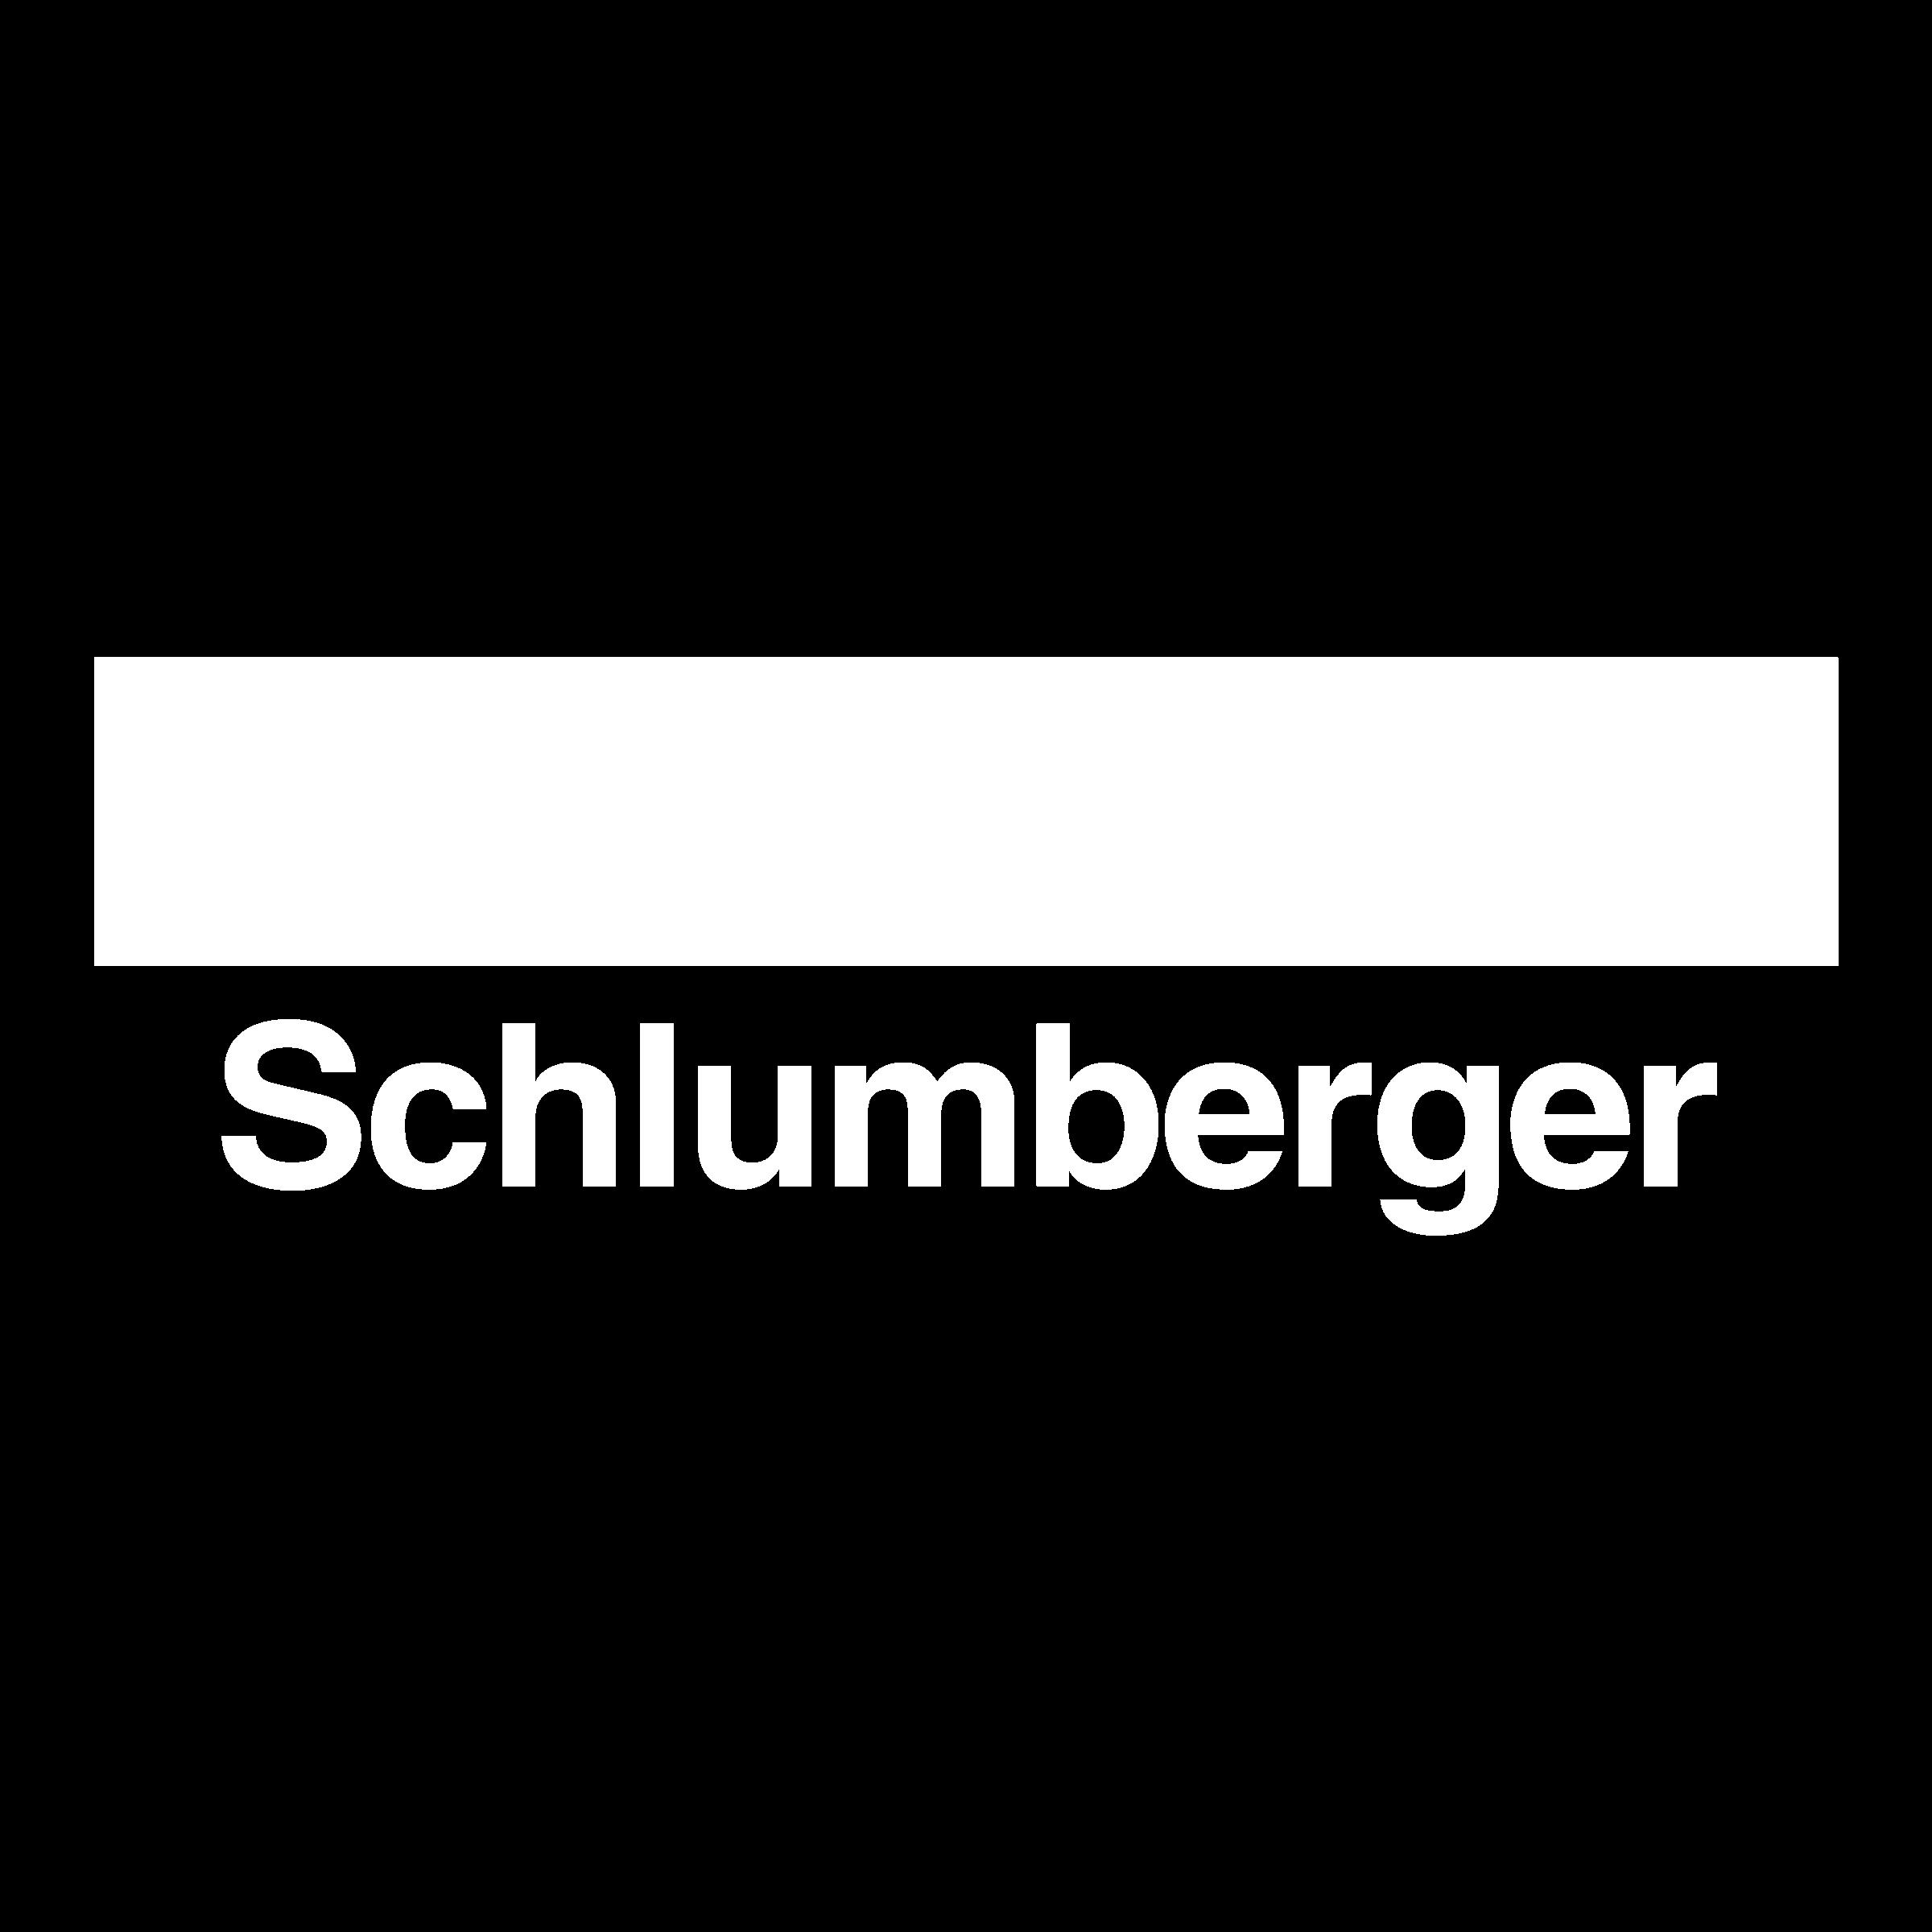 Schlumberger Logo PNG Transparent & SVG Vector - Freebie Supply